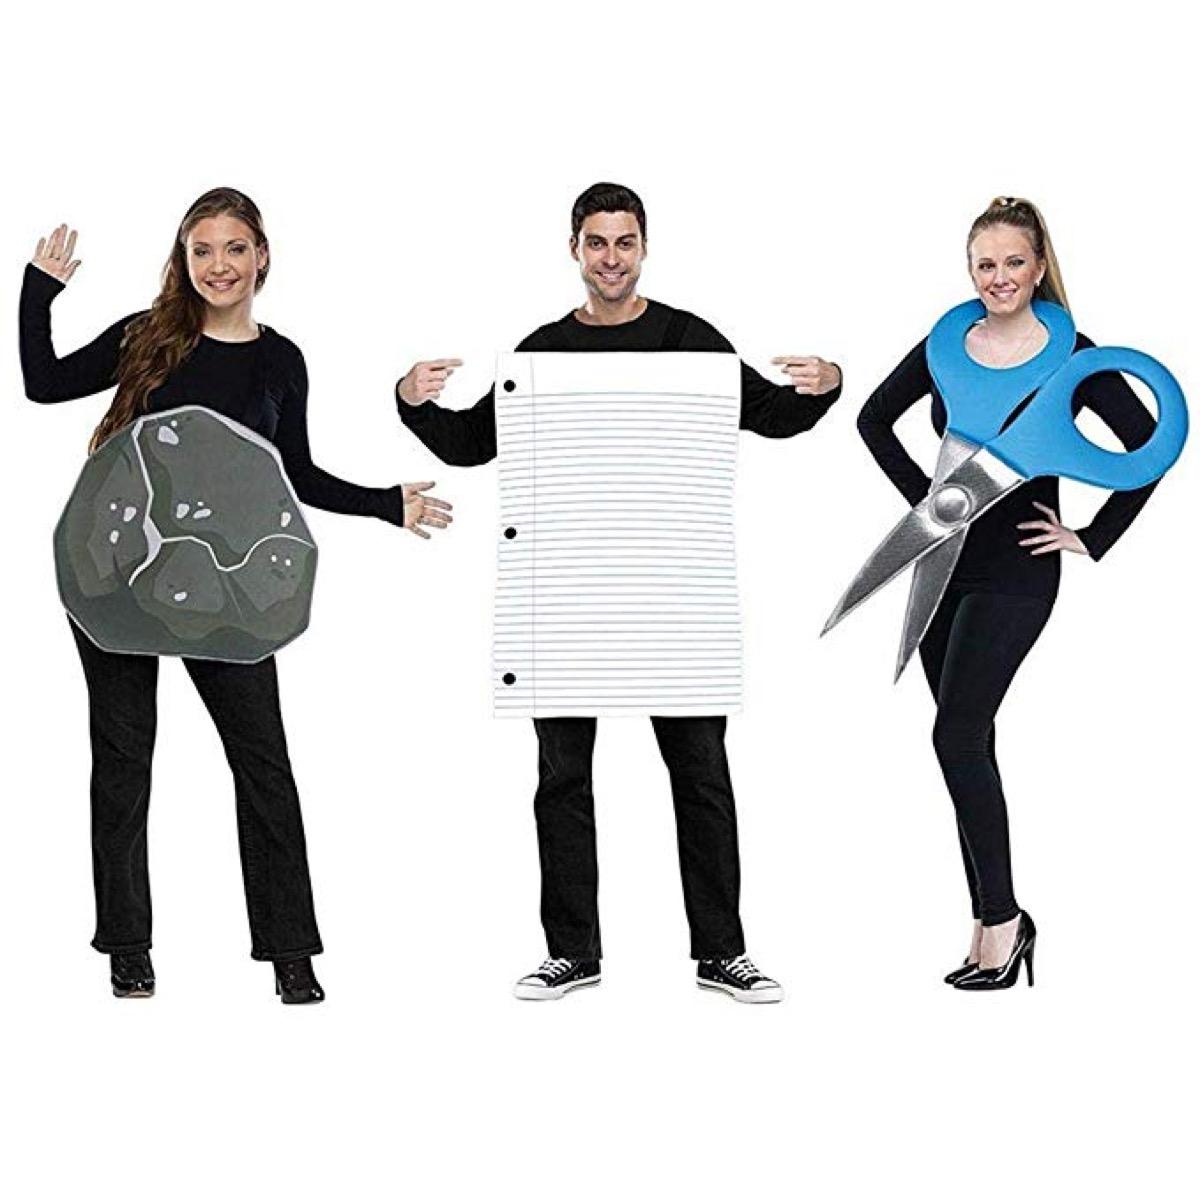 rock paper scissors costumes, family halloween costumes